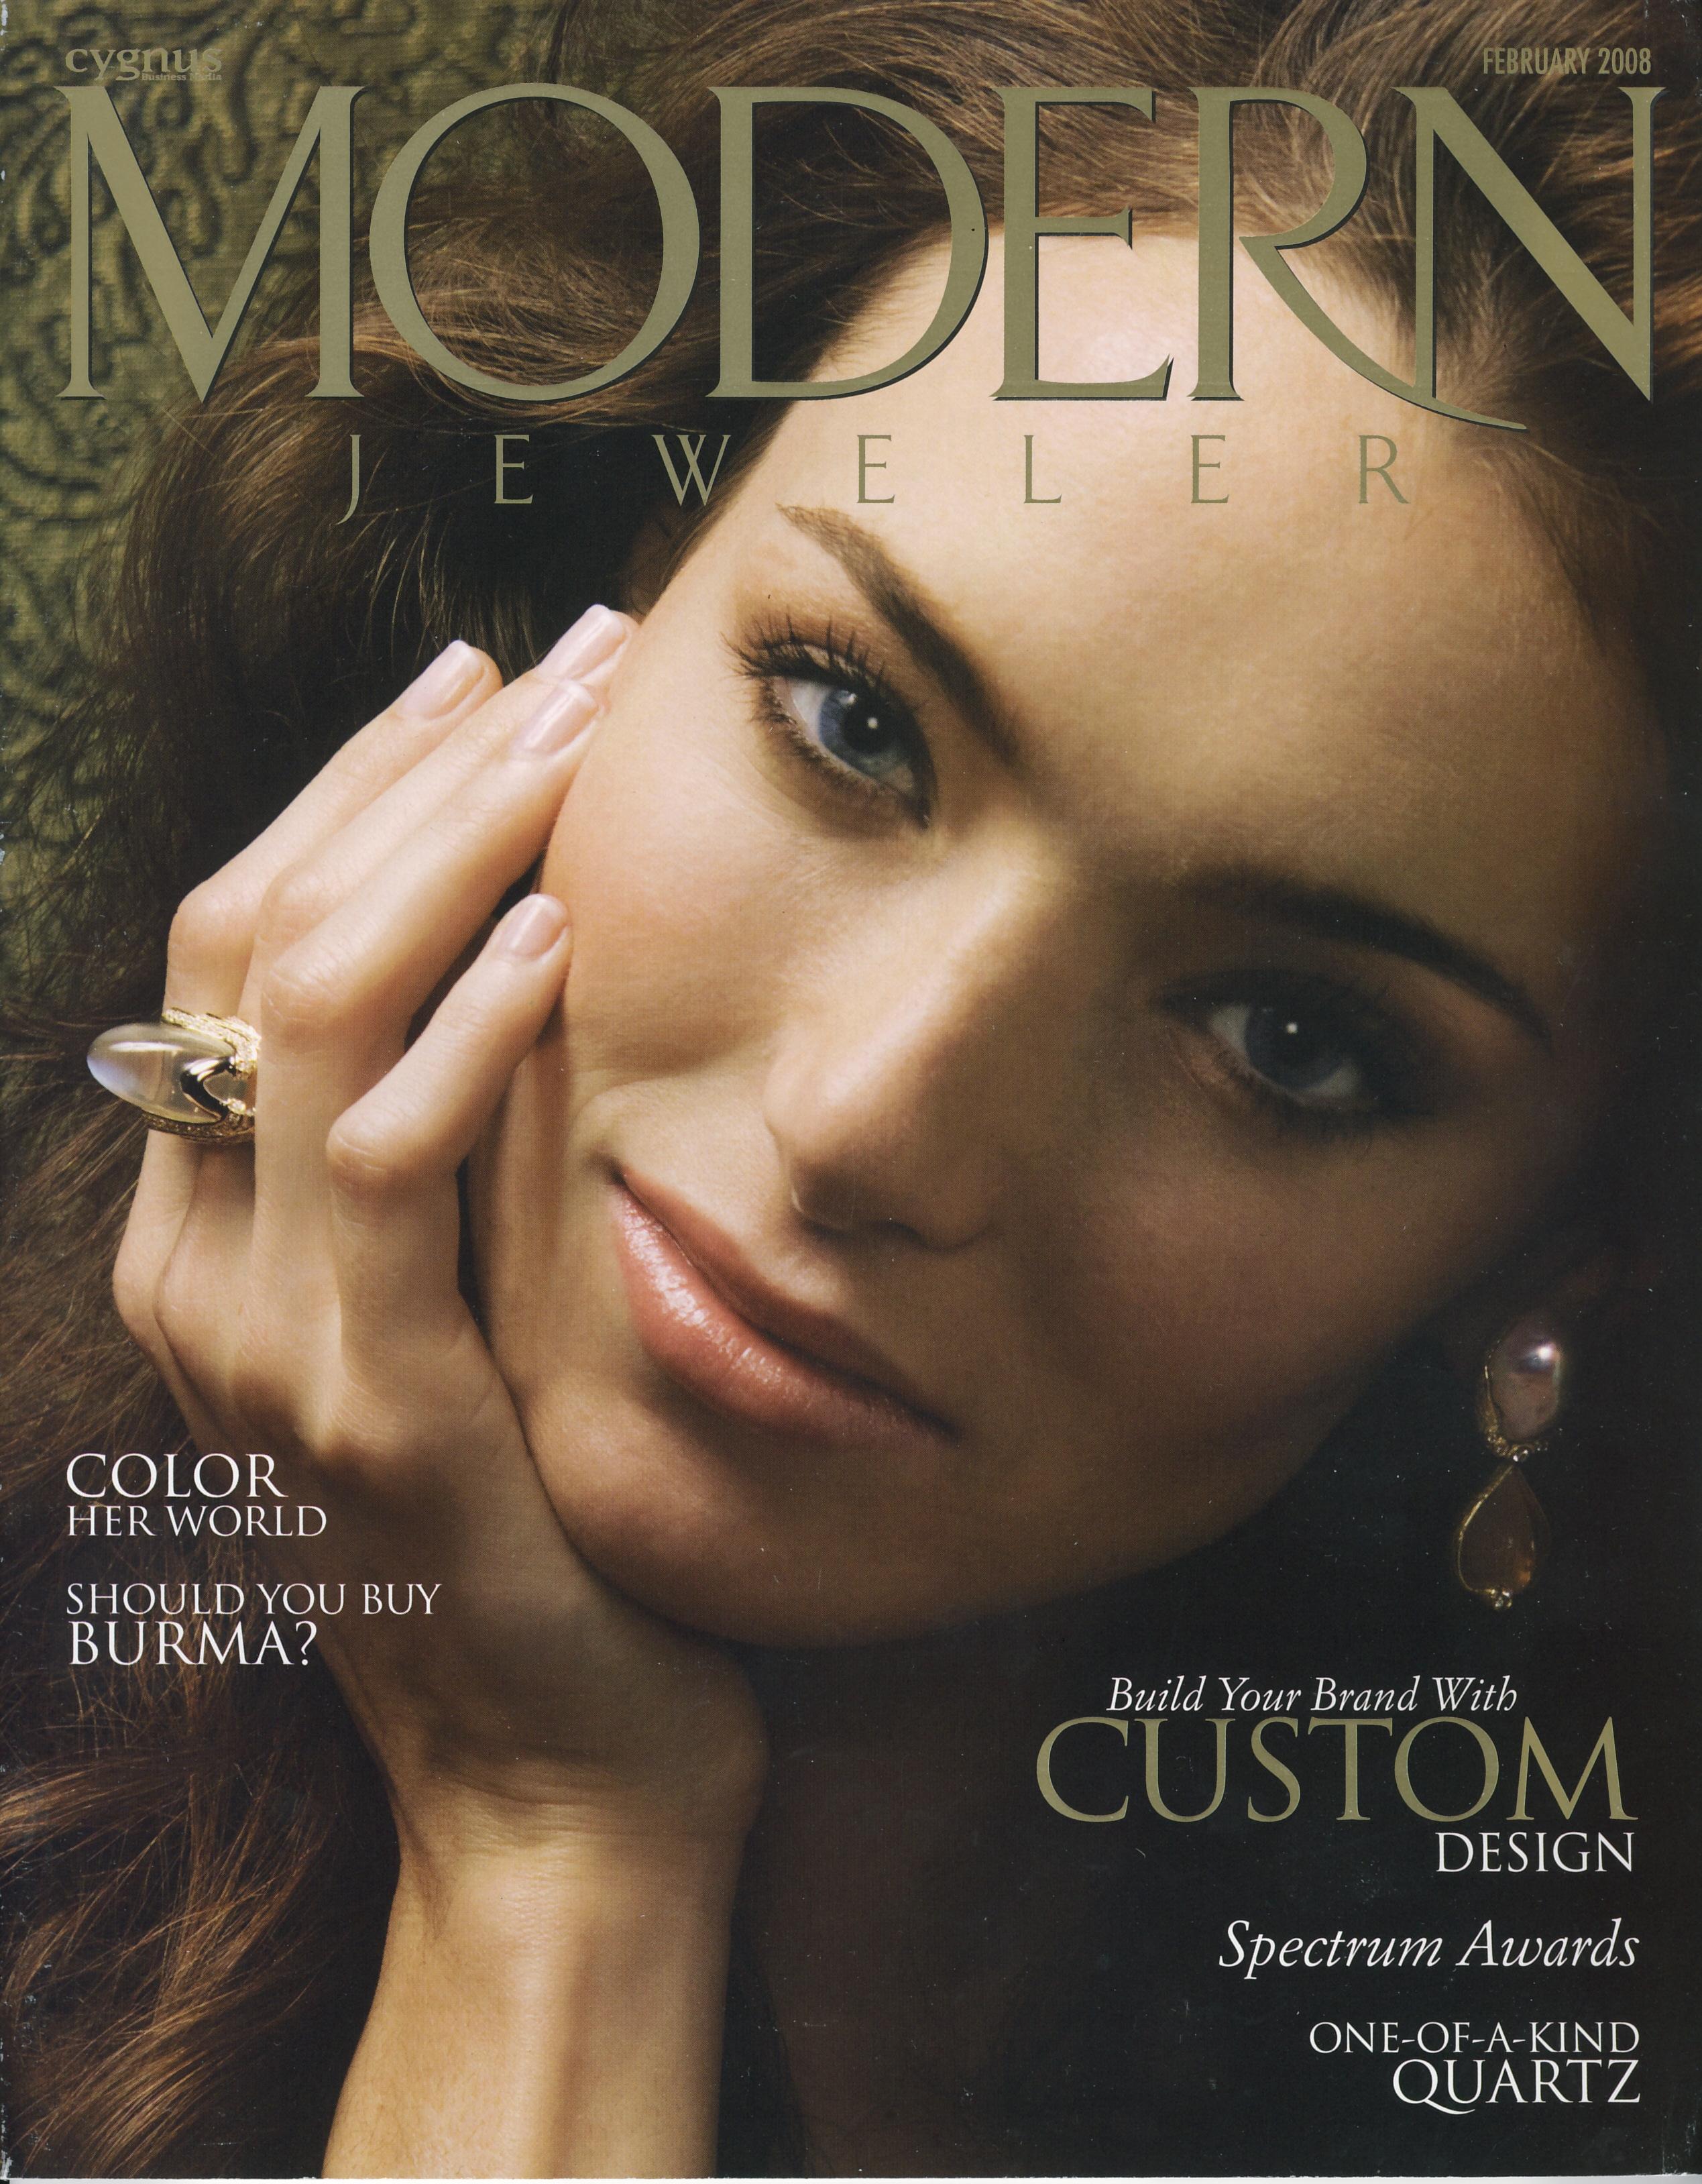 Modern Jeweler February 2008